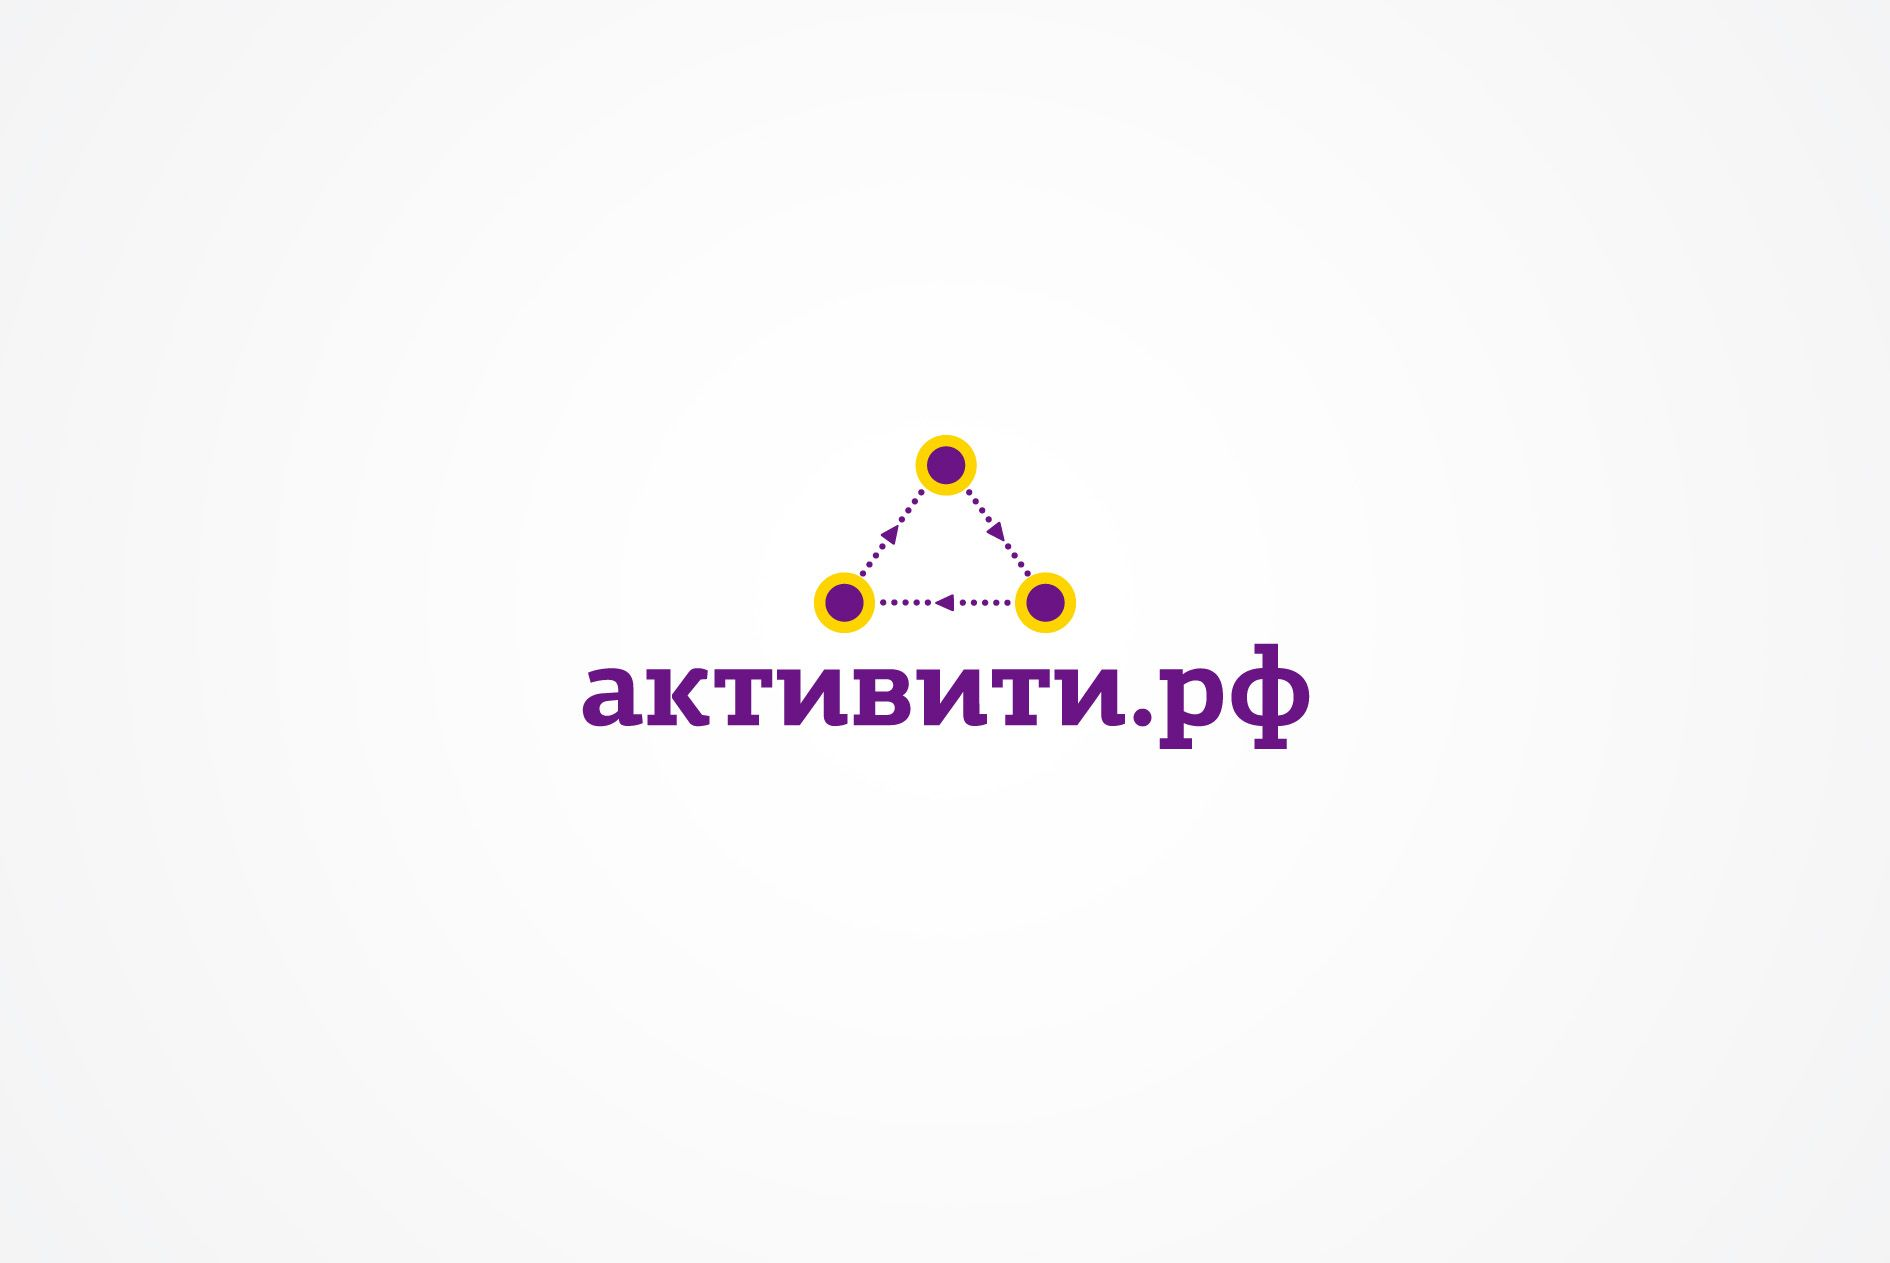 Логотип магазина активити.рф - дизайнер sexposs